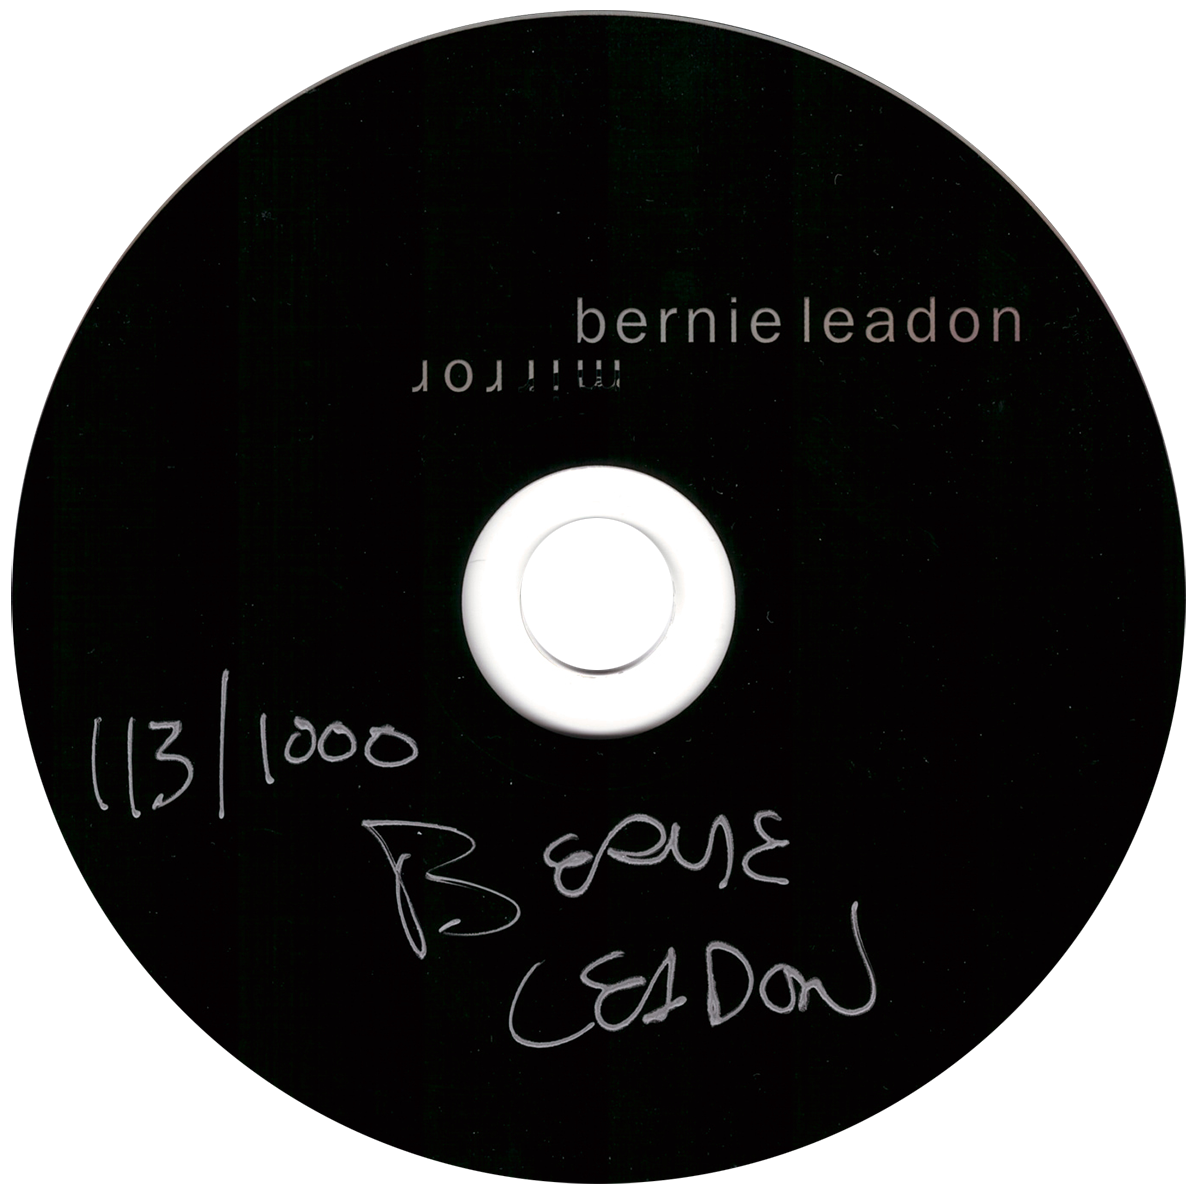 Bernie Leadon CD - MIrror